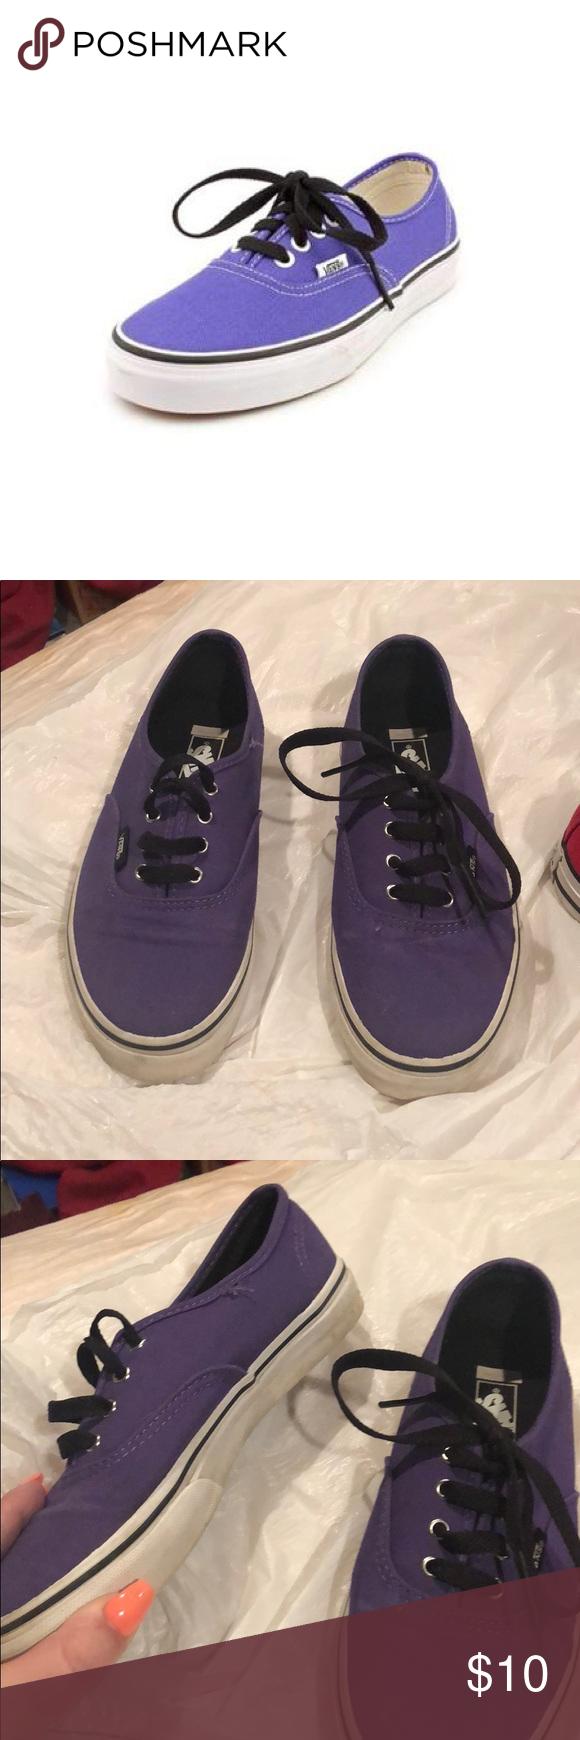 8d935bb8be Children s Vans Kid s authentic vans!! Need to get rid of these Vans Shoes  Sneakers